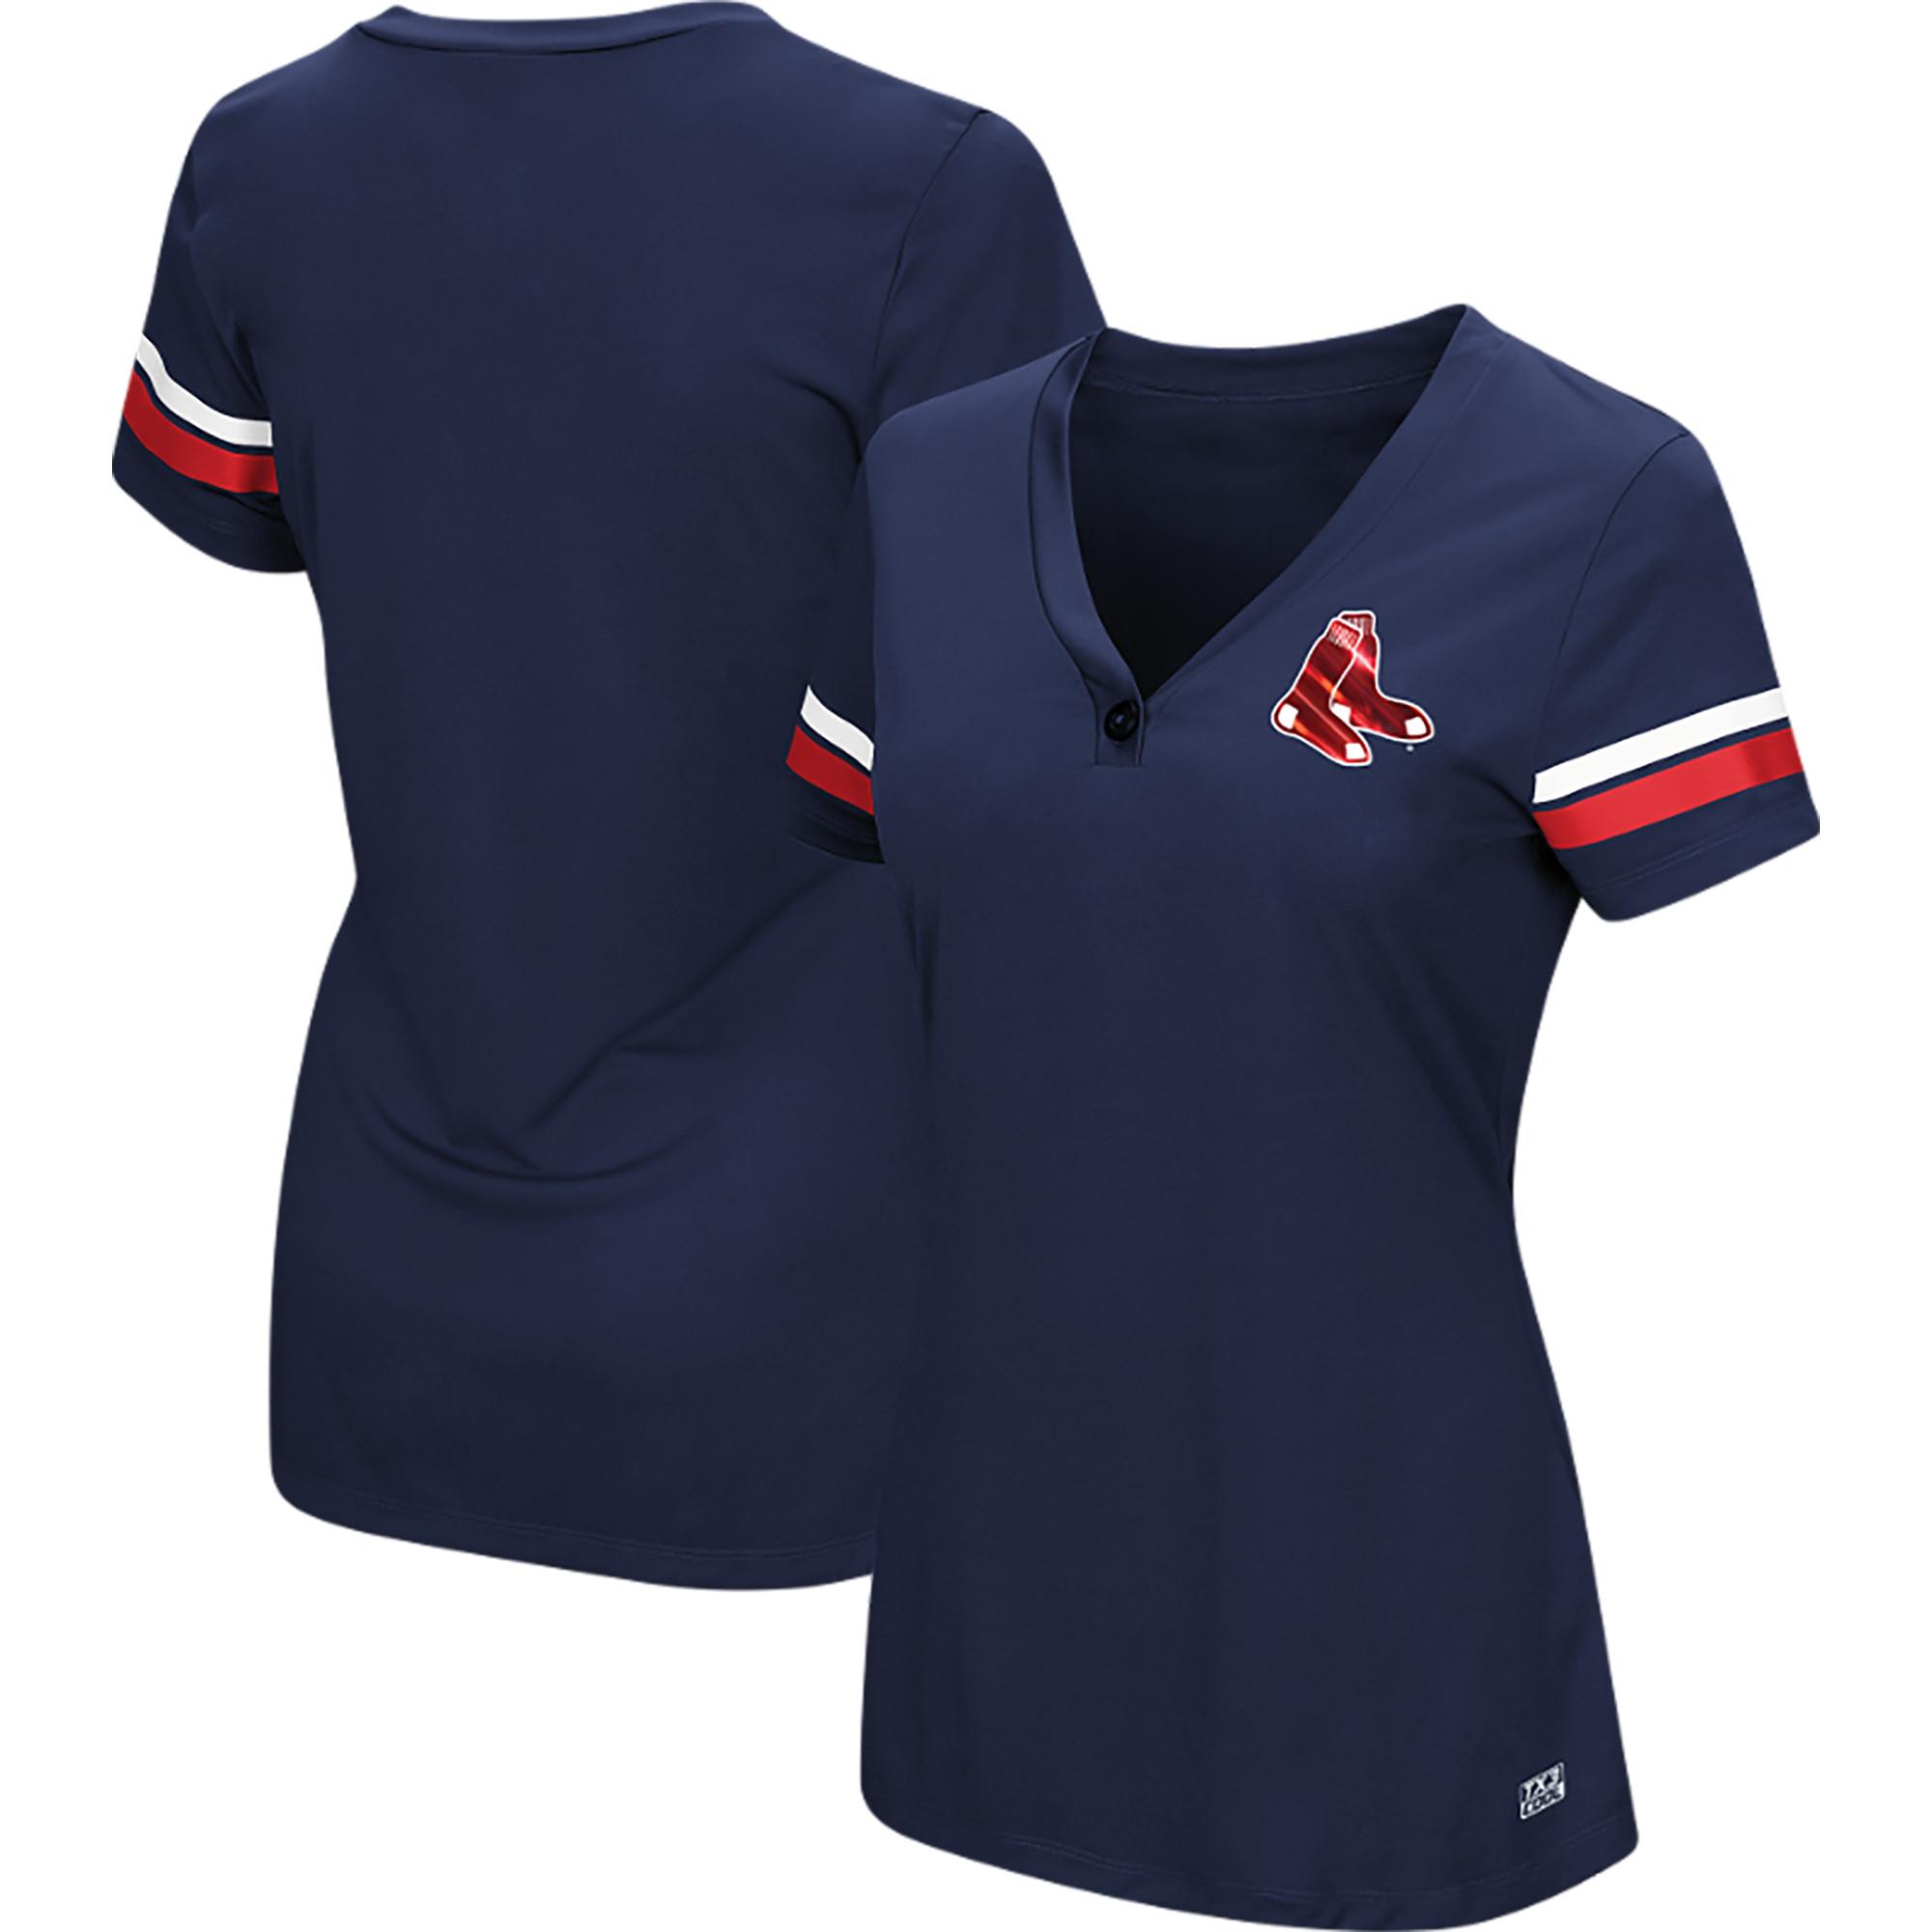 Women's Majestic Navy Boston Red Sox Plus Size Sparkling Fun Button V-Neck T-Shirt